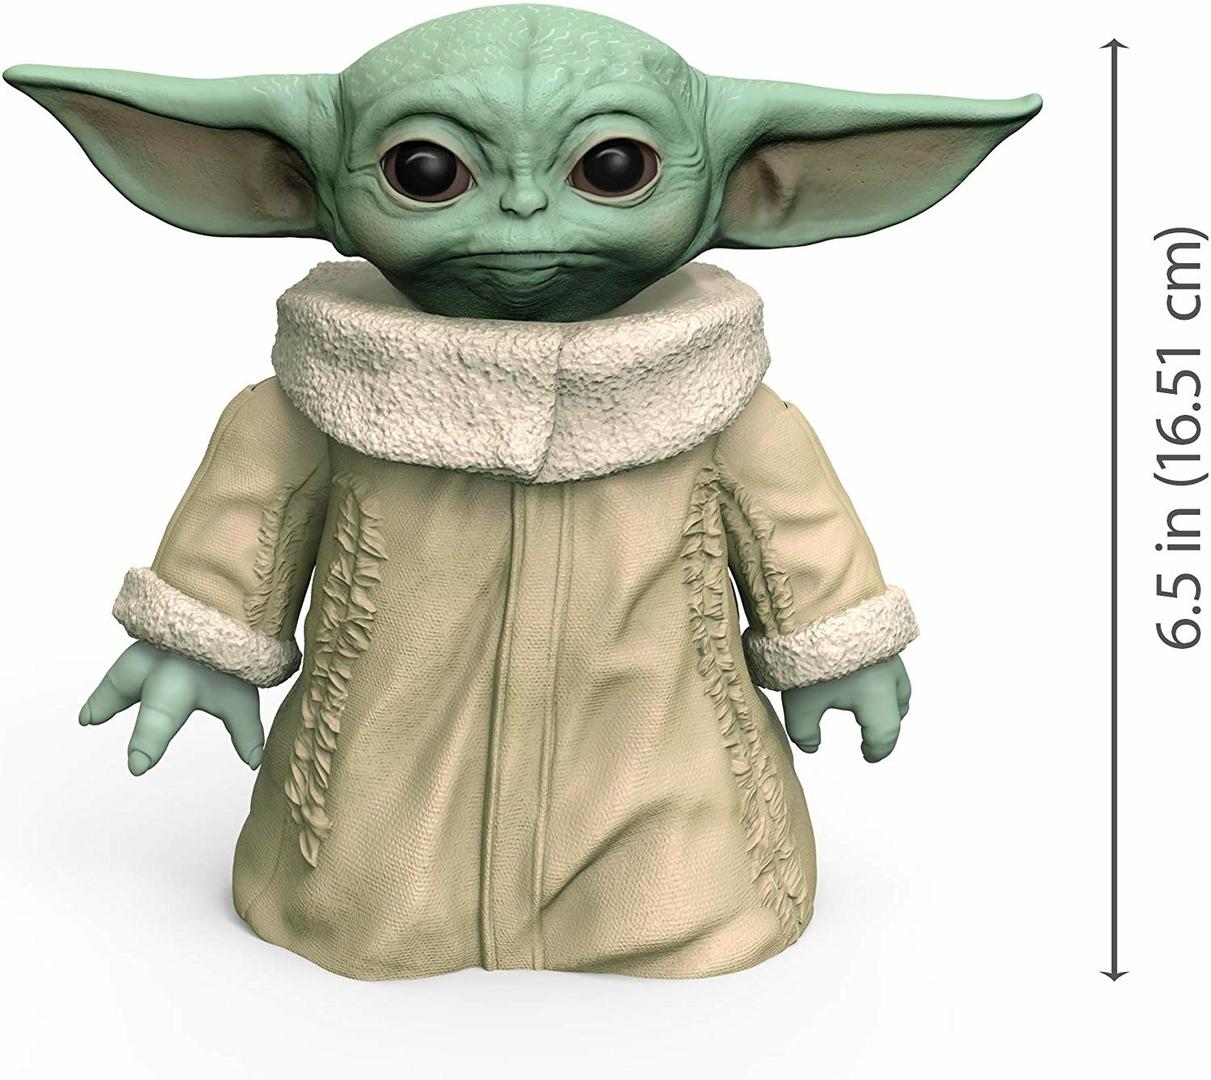 Figurine Star Wars The Mandalorian The Child - Baby Yoda 16cm 1001 Figurines 2